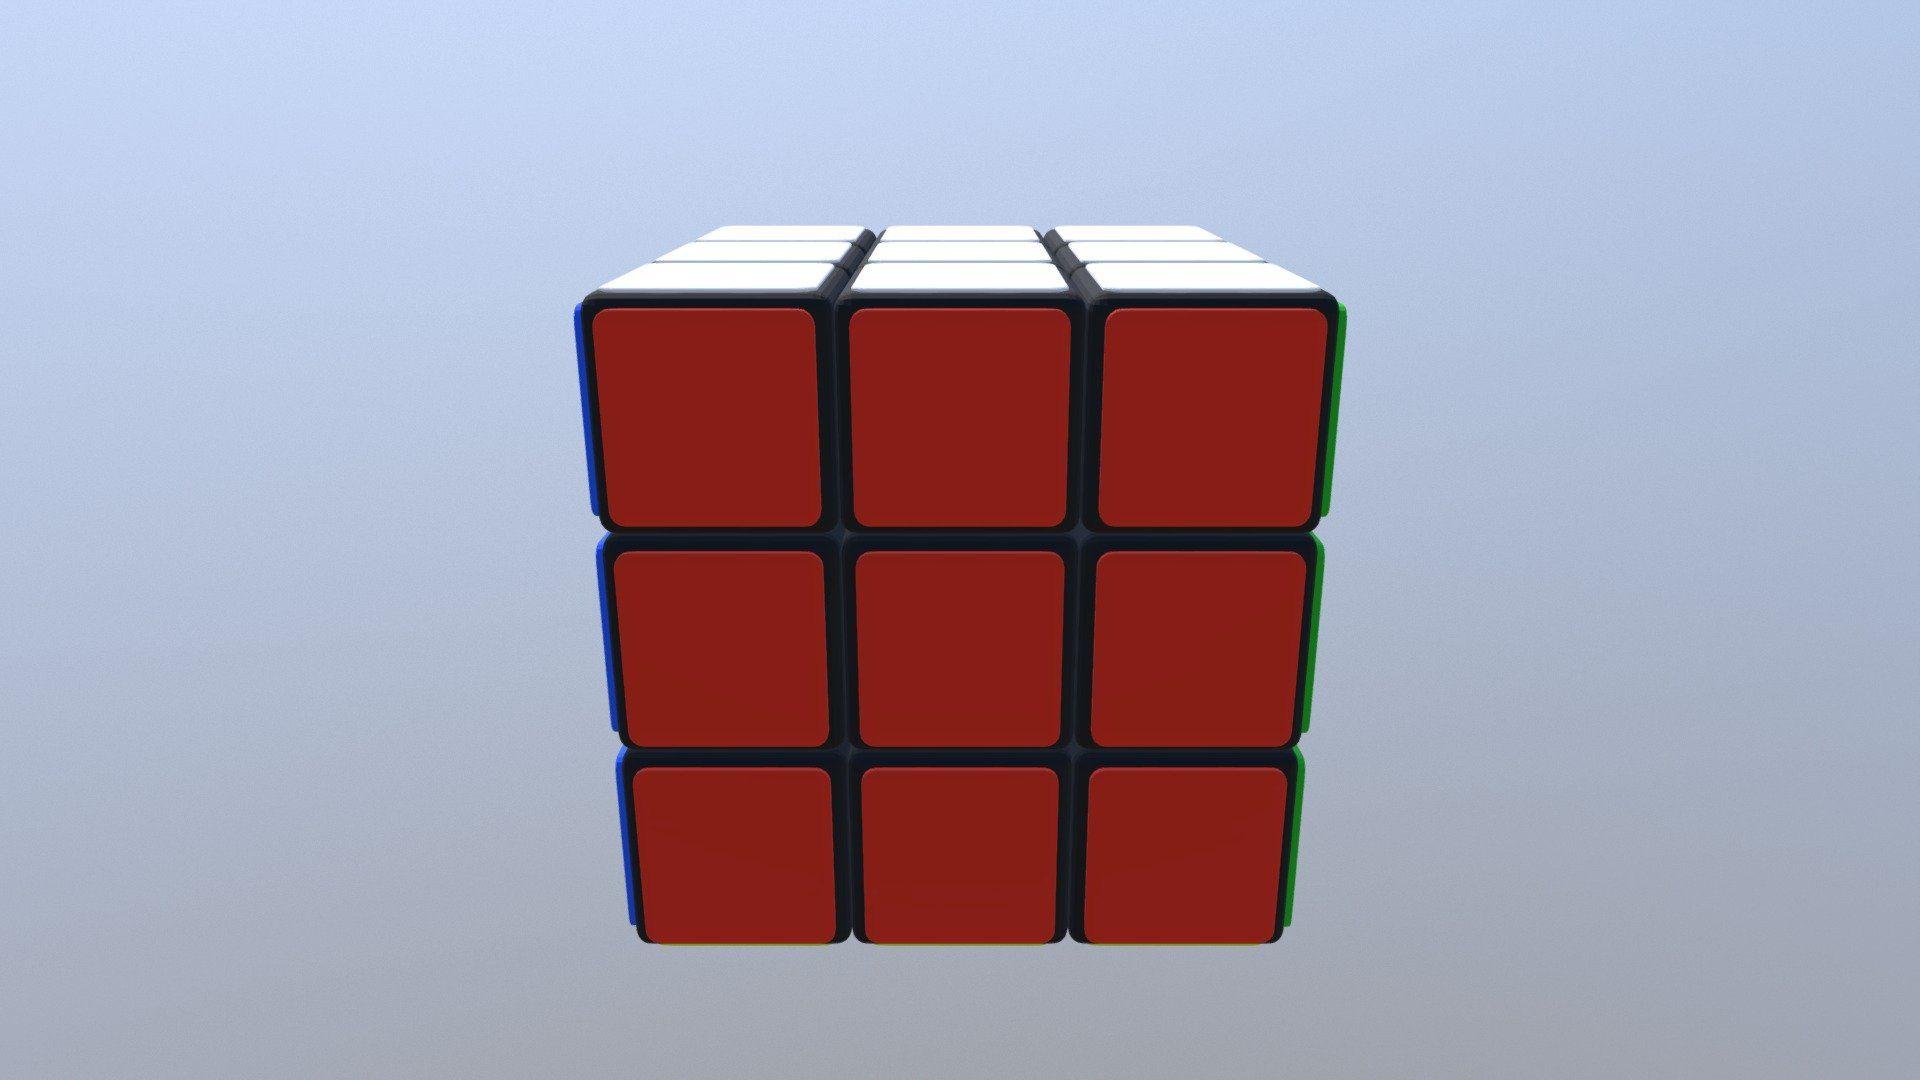 Rubiks Cube a wallpaper